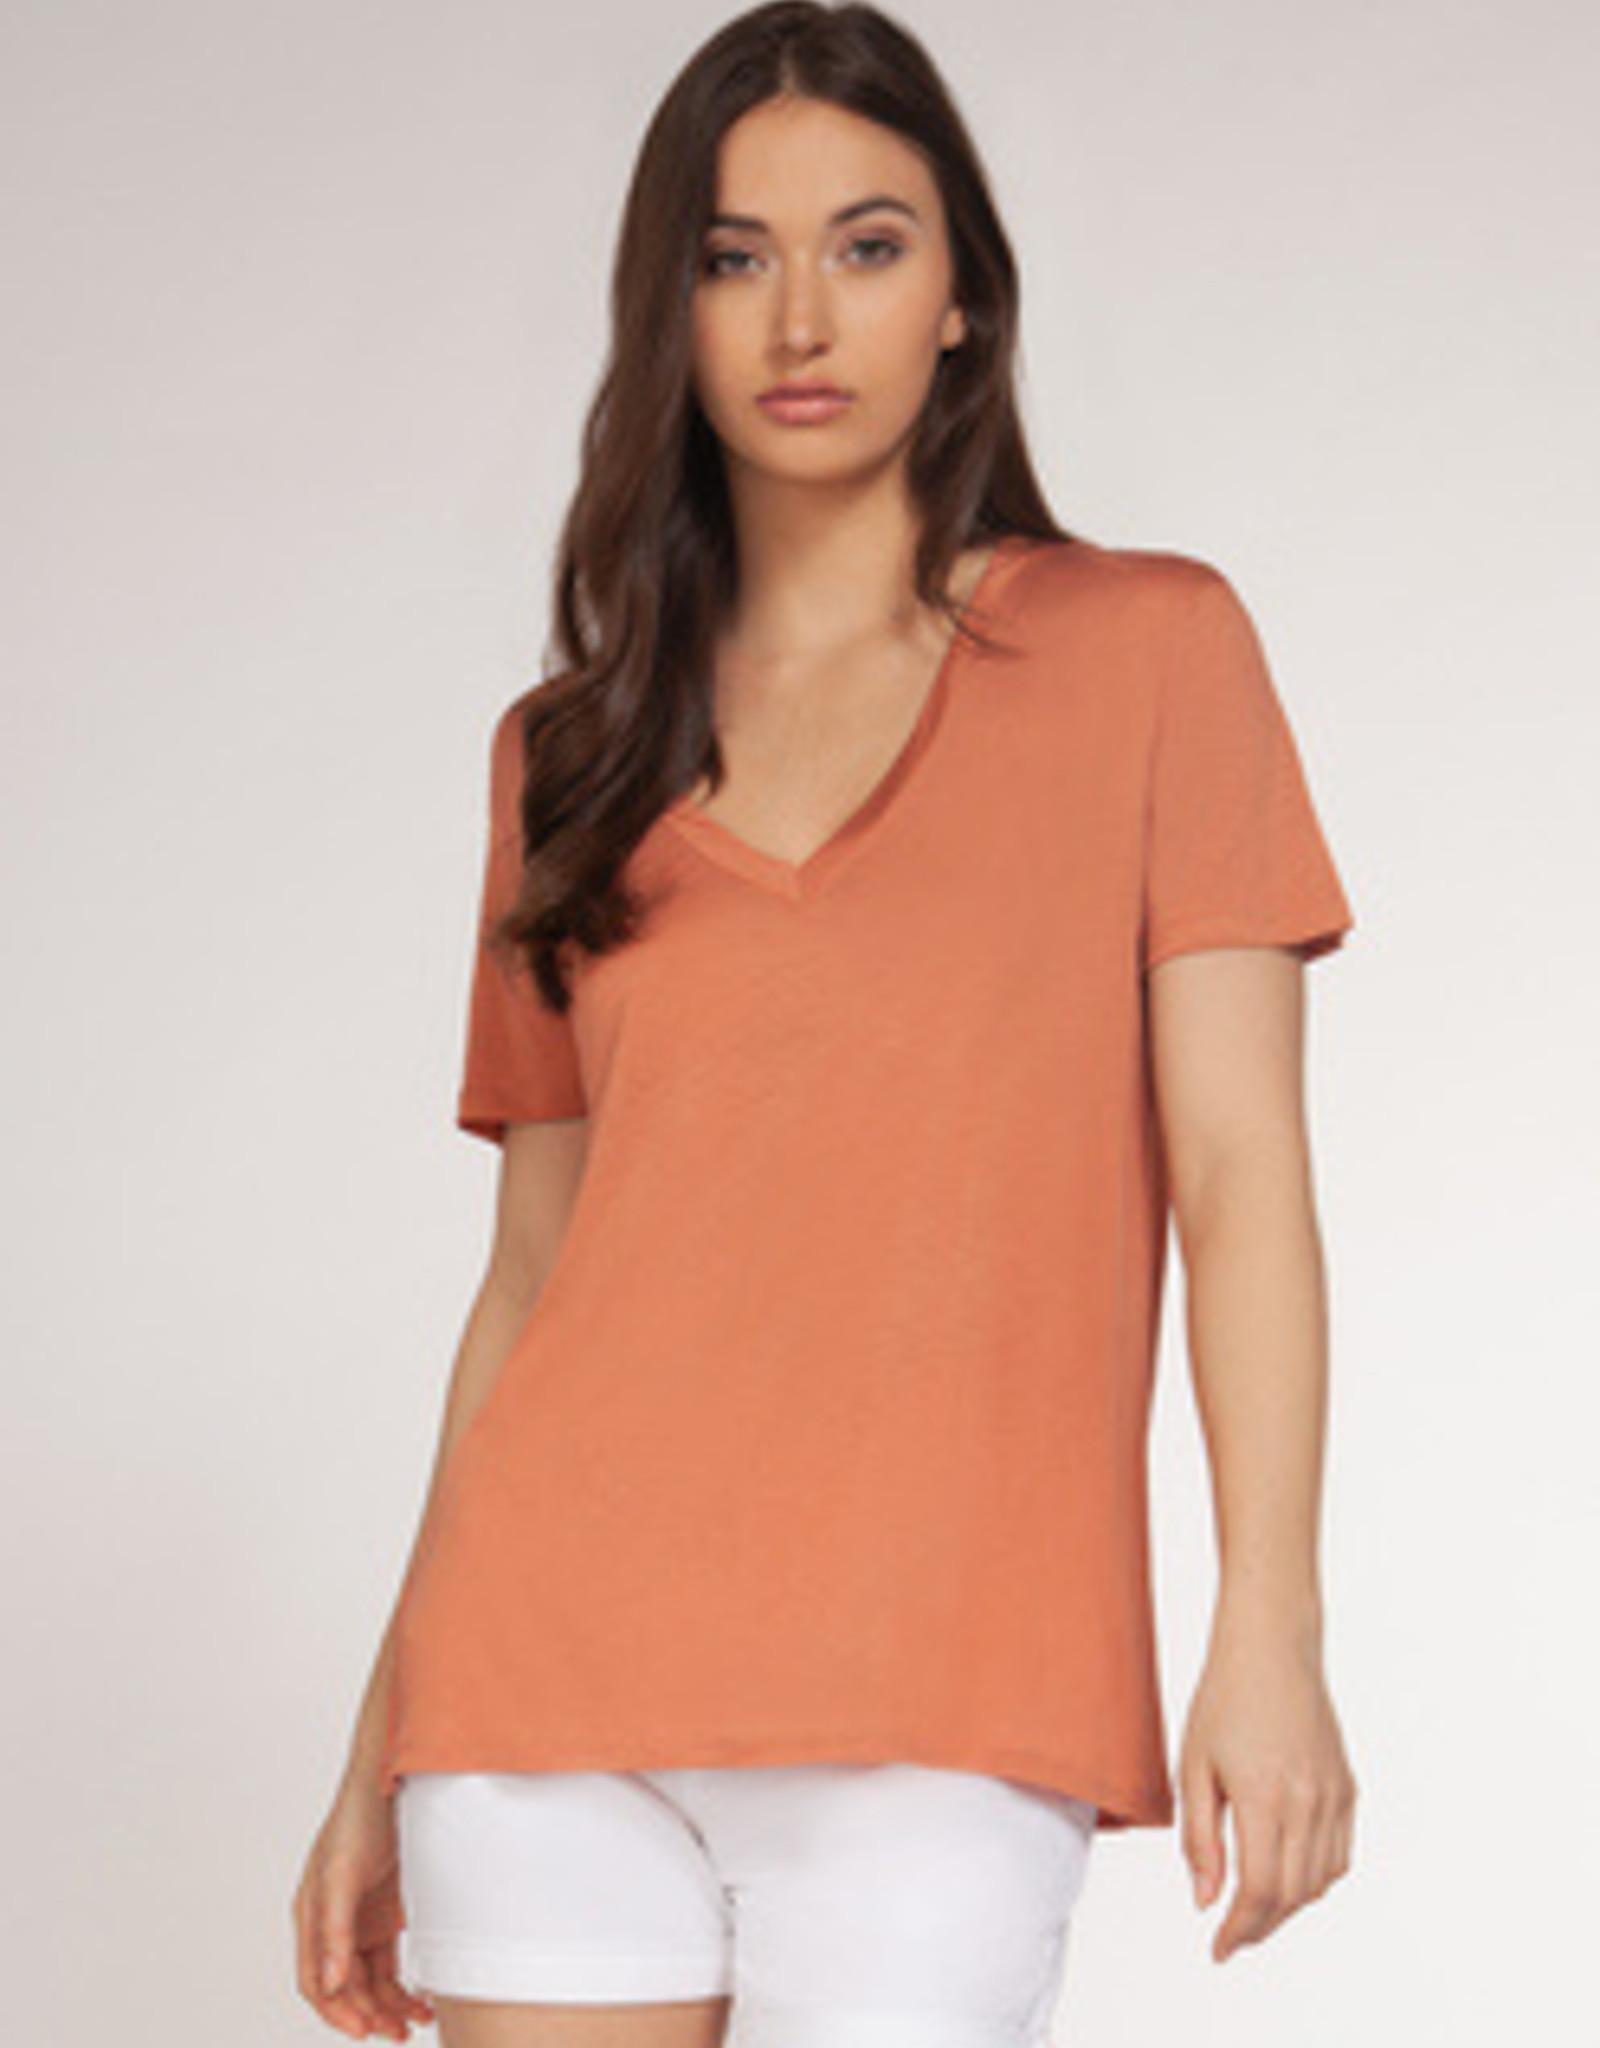 Dex Bros Clothing Co Ltd. Short sleeve v-neck tee, coral